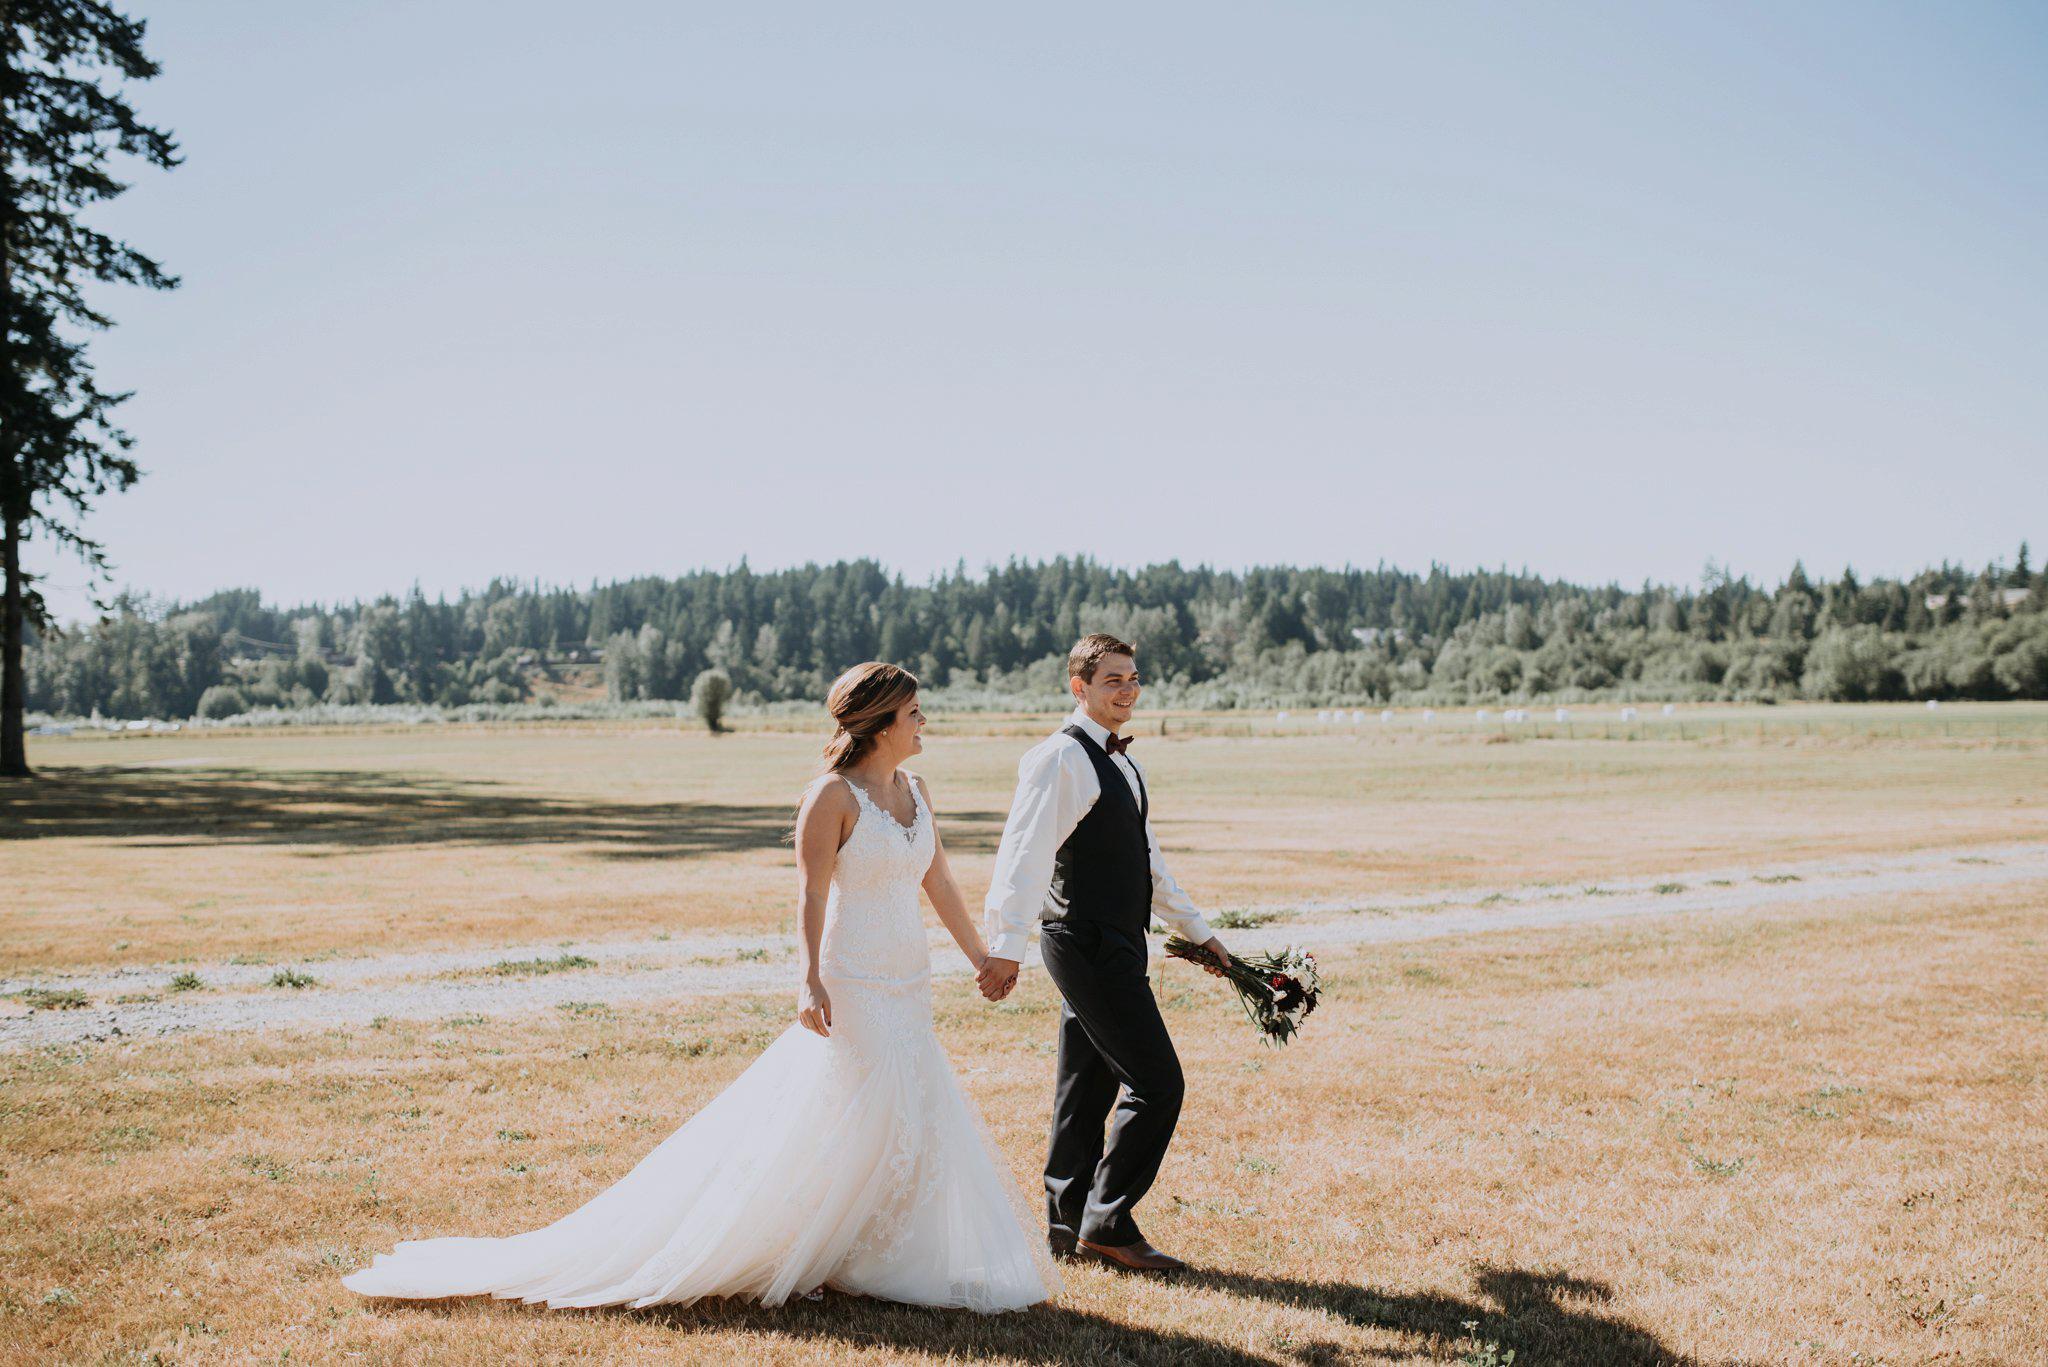 kristen-and-cody-the-kelley-farm-wedding-seattle-photographer-caitlyn-nikula-53.jpg